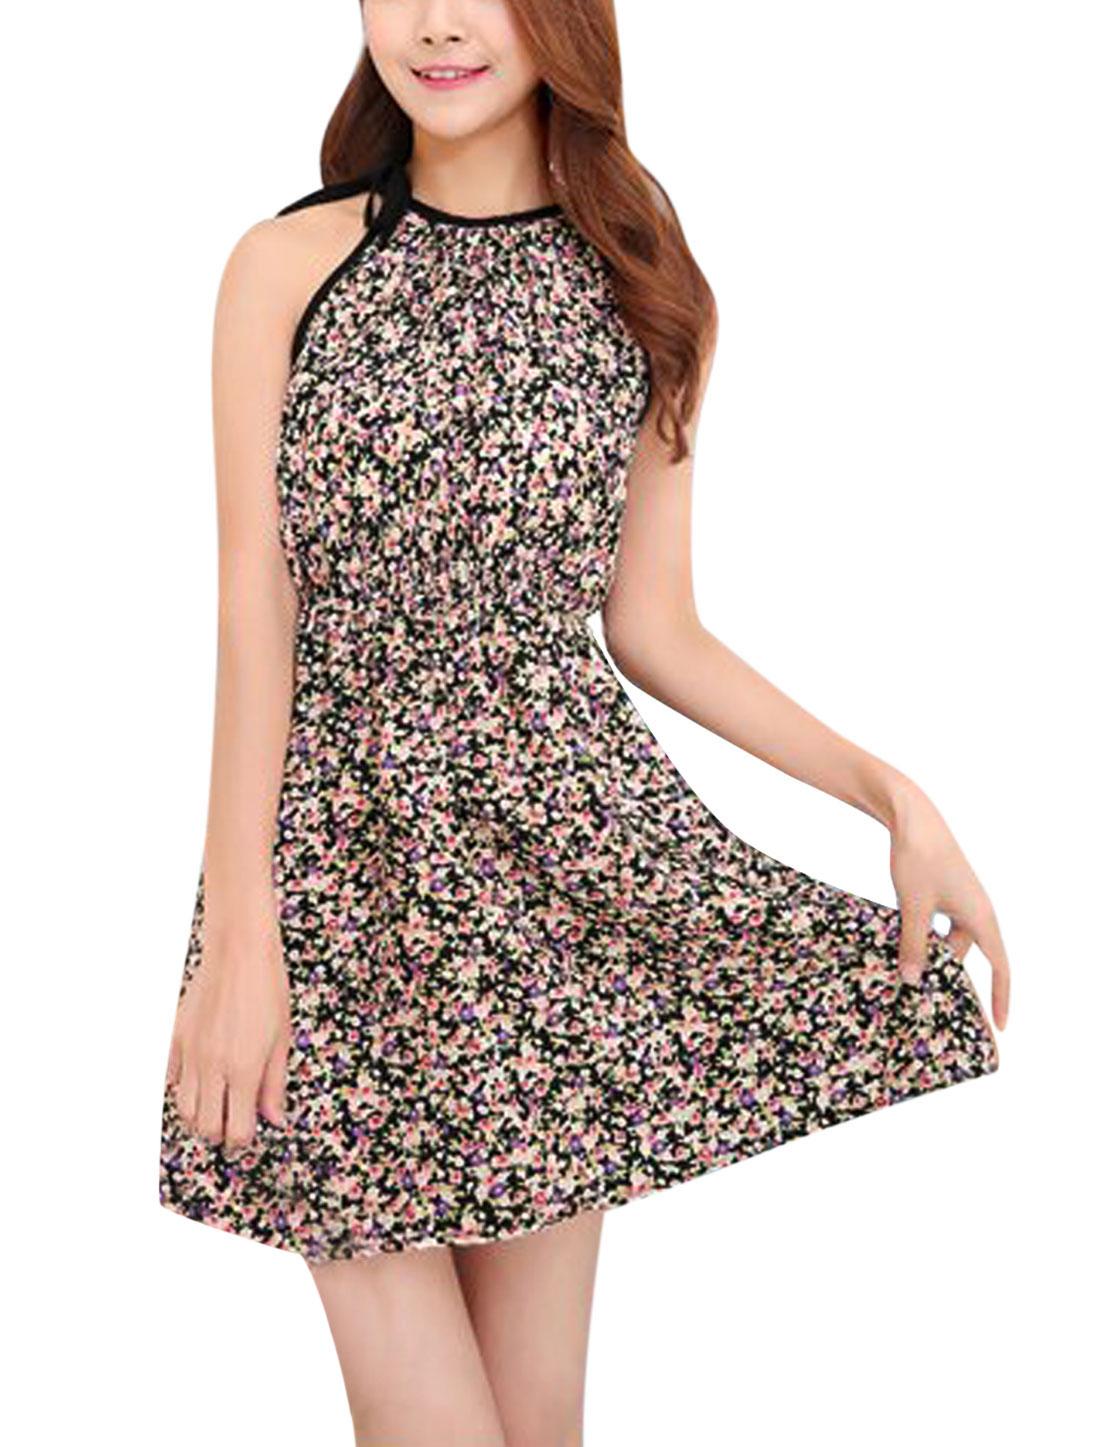 Women Round Neck Sleeveless Self Tie Straps Casual Tea Dress Black XS